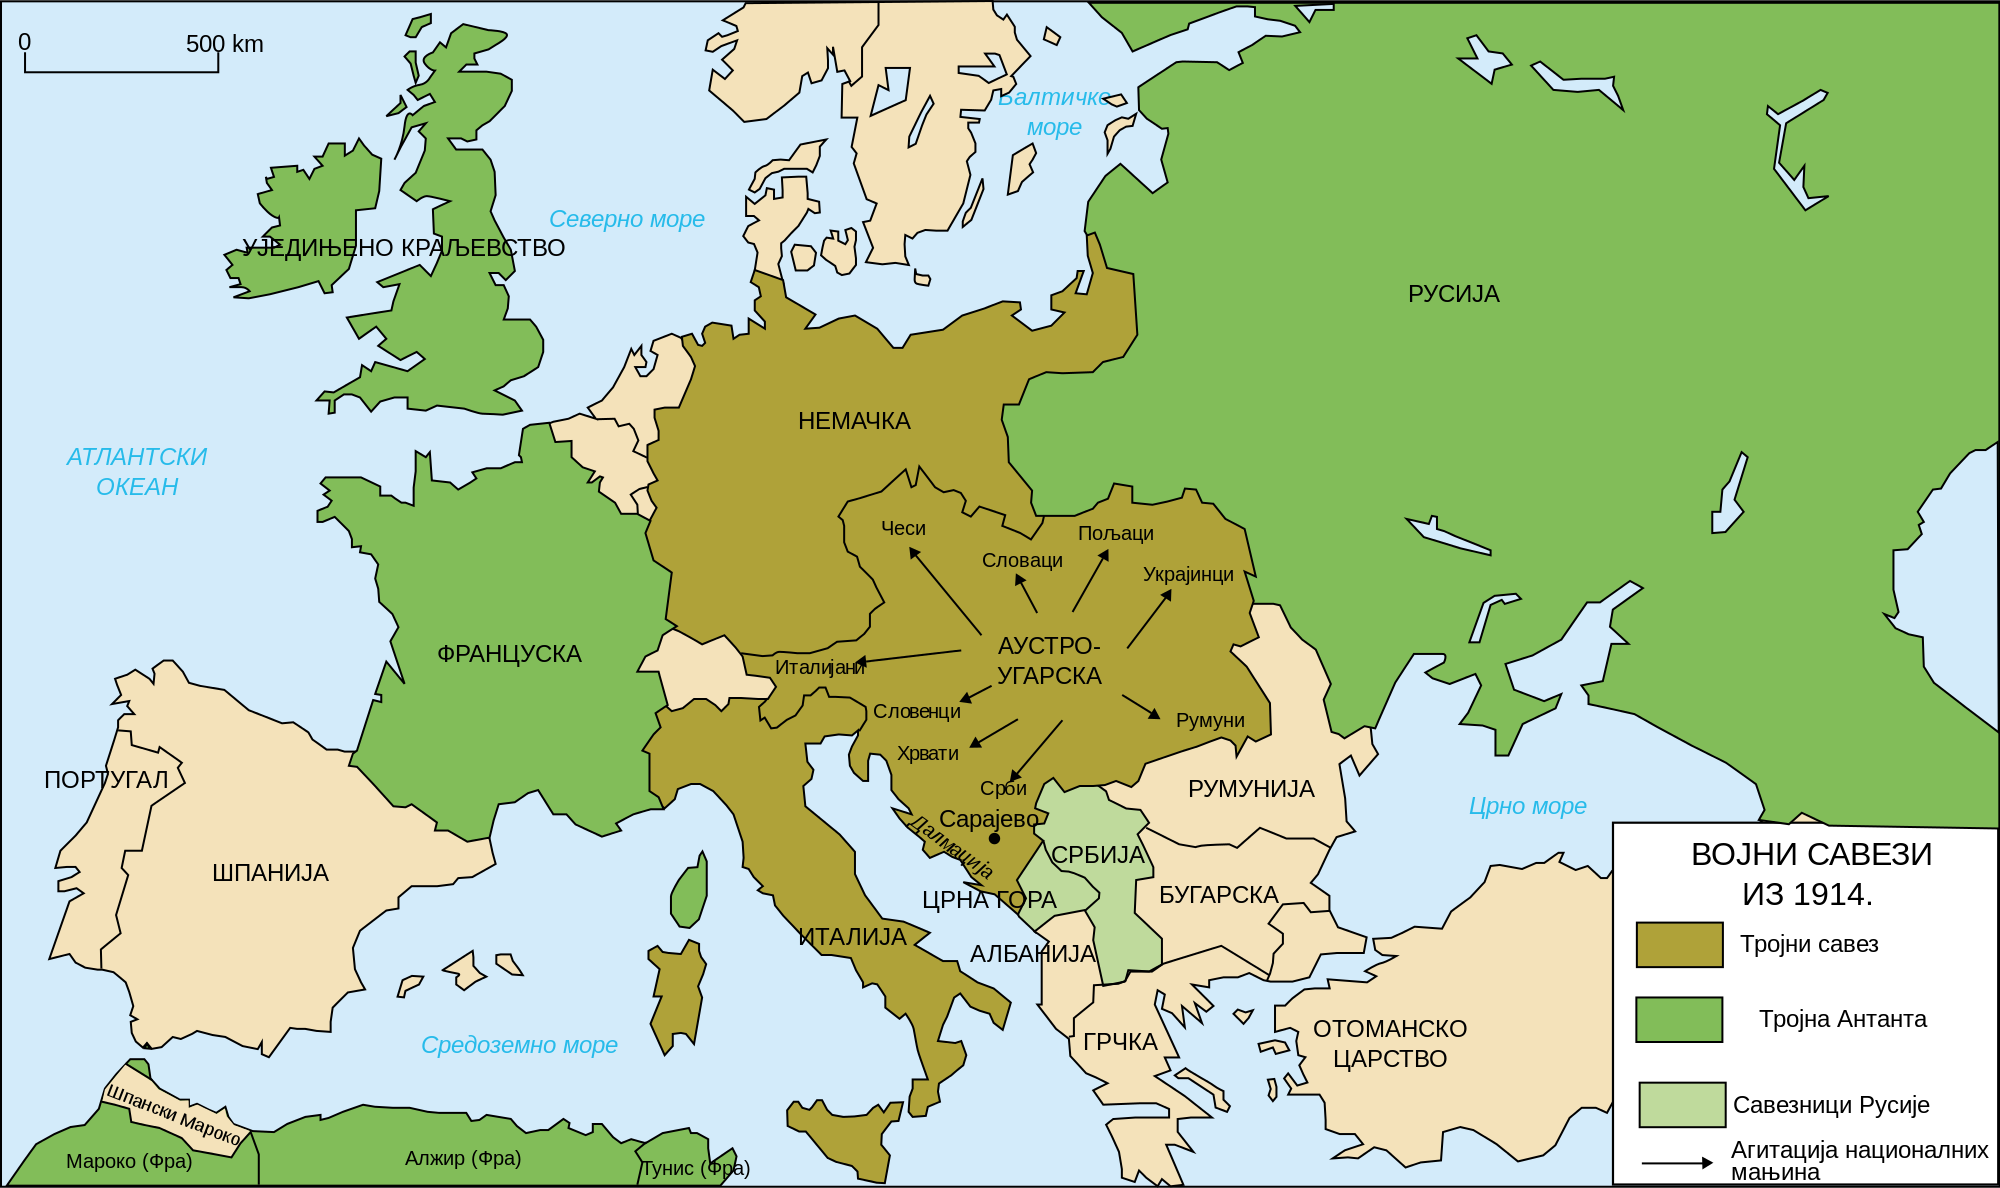 mapa evrope 1914 STO GODINA OD VELIKOG RATA mapa evrope 1914